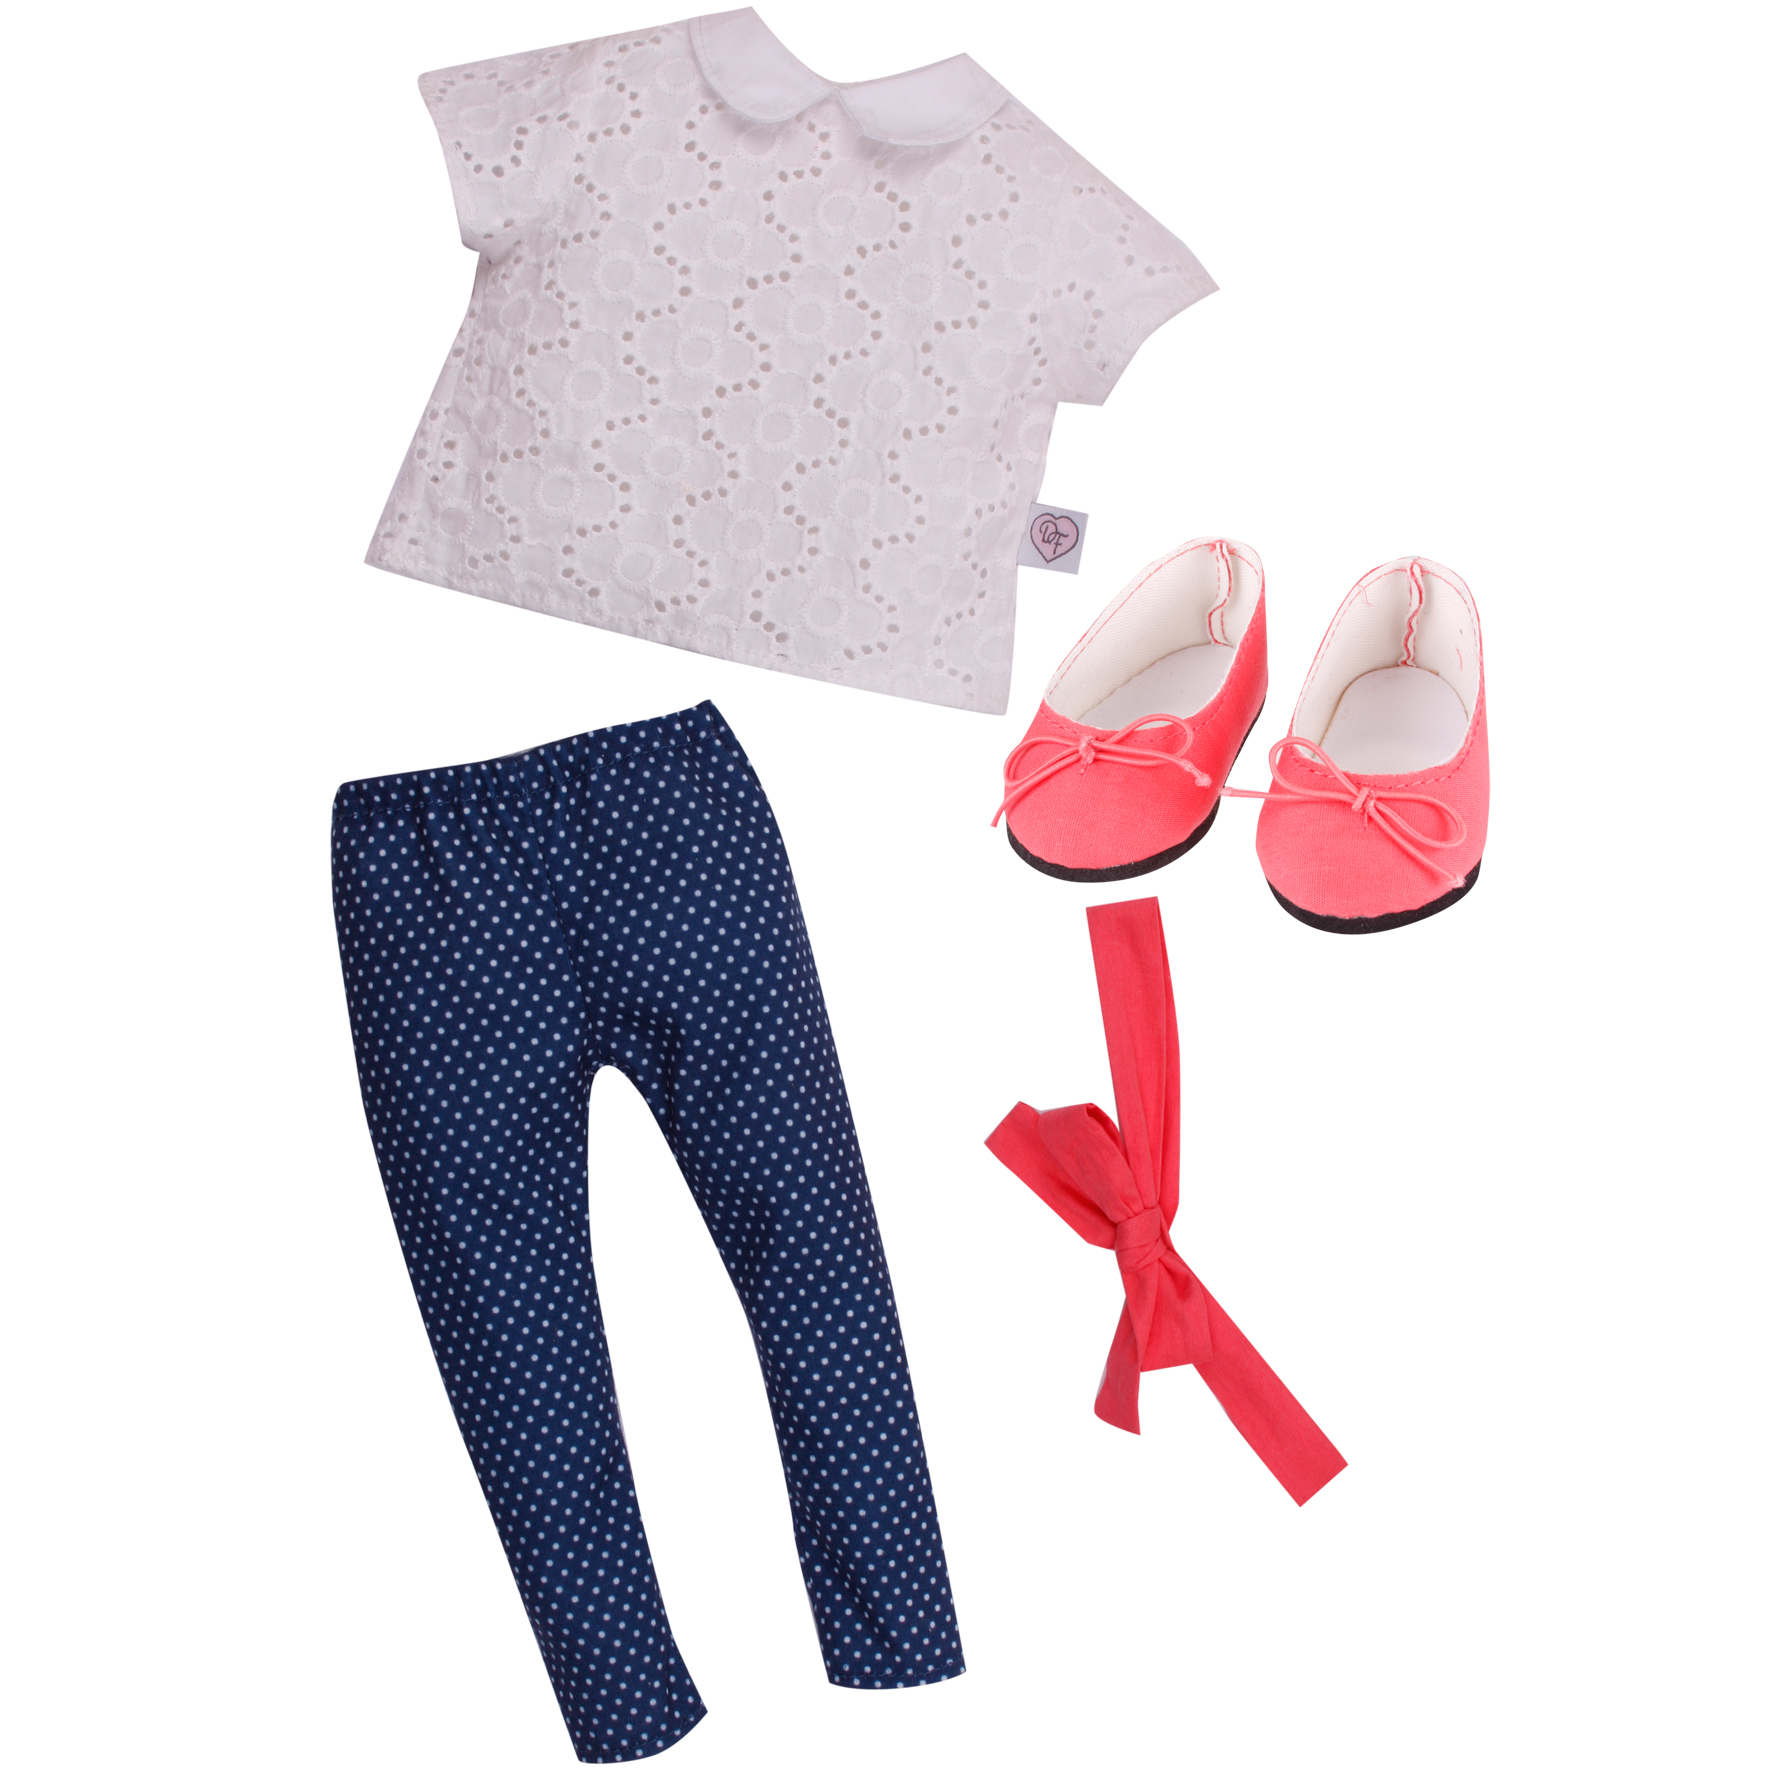 Design a Friend Boho Chic outfit